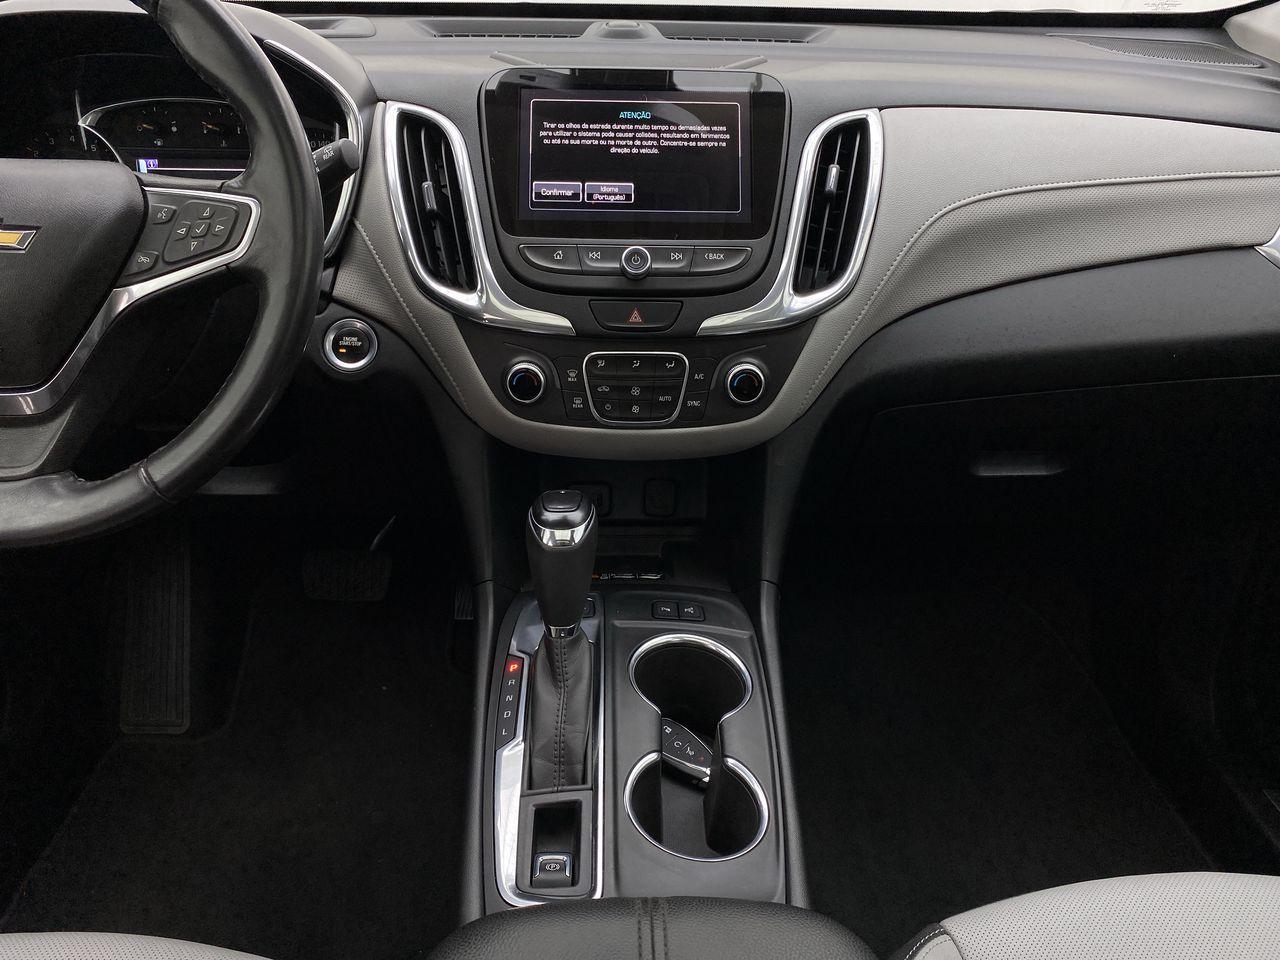 EQUINOX Premier 2.0 Turbo AWD 262cv Aut.